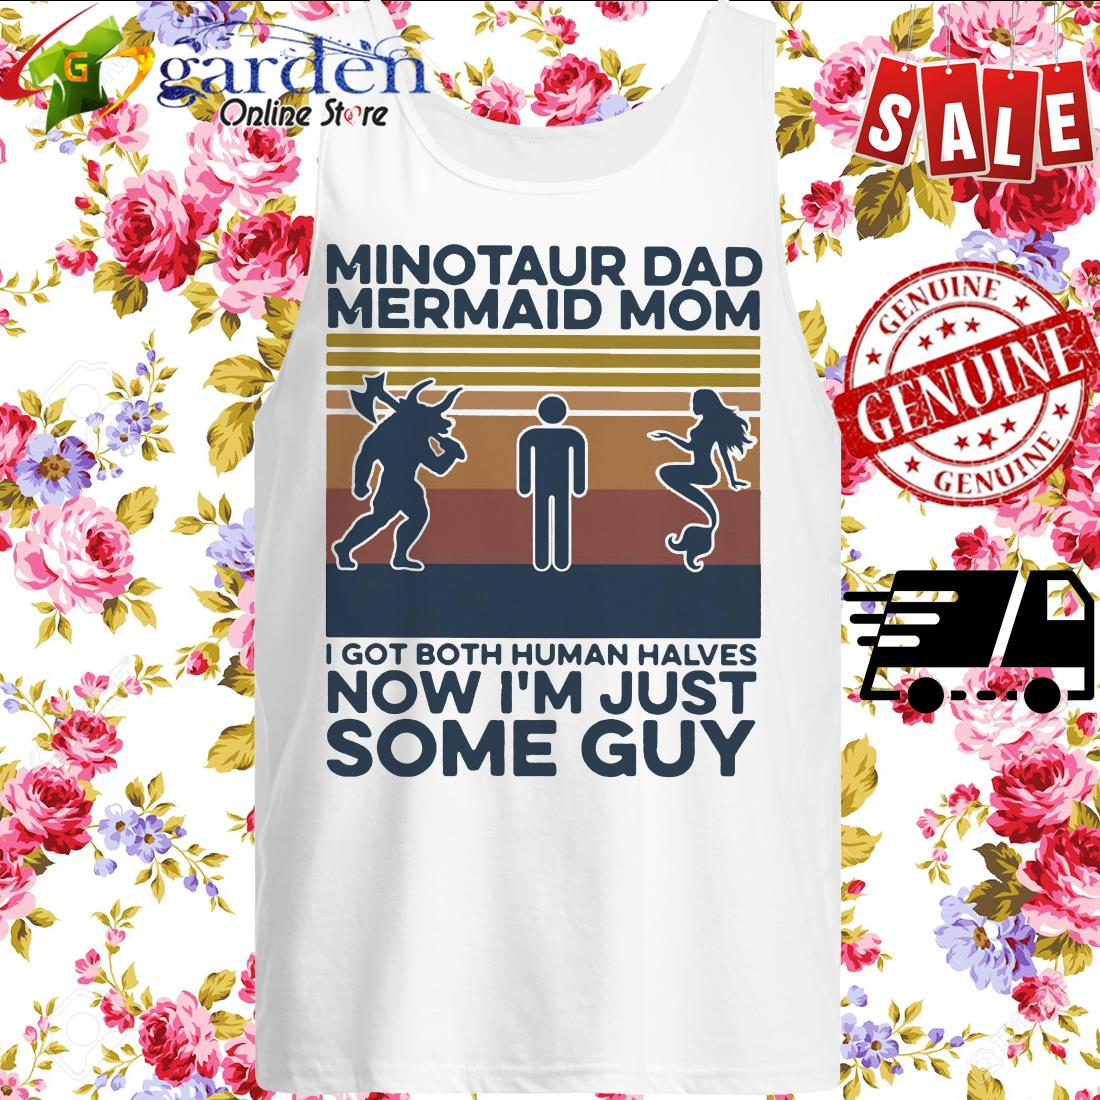 Minotaur dad mermaid mom I got both human halves now I'm just some guy vintage tank top